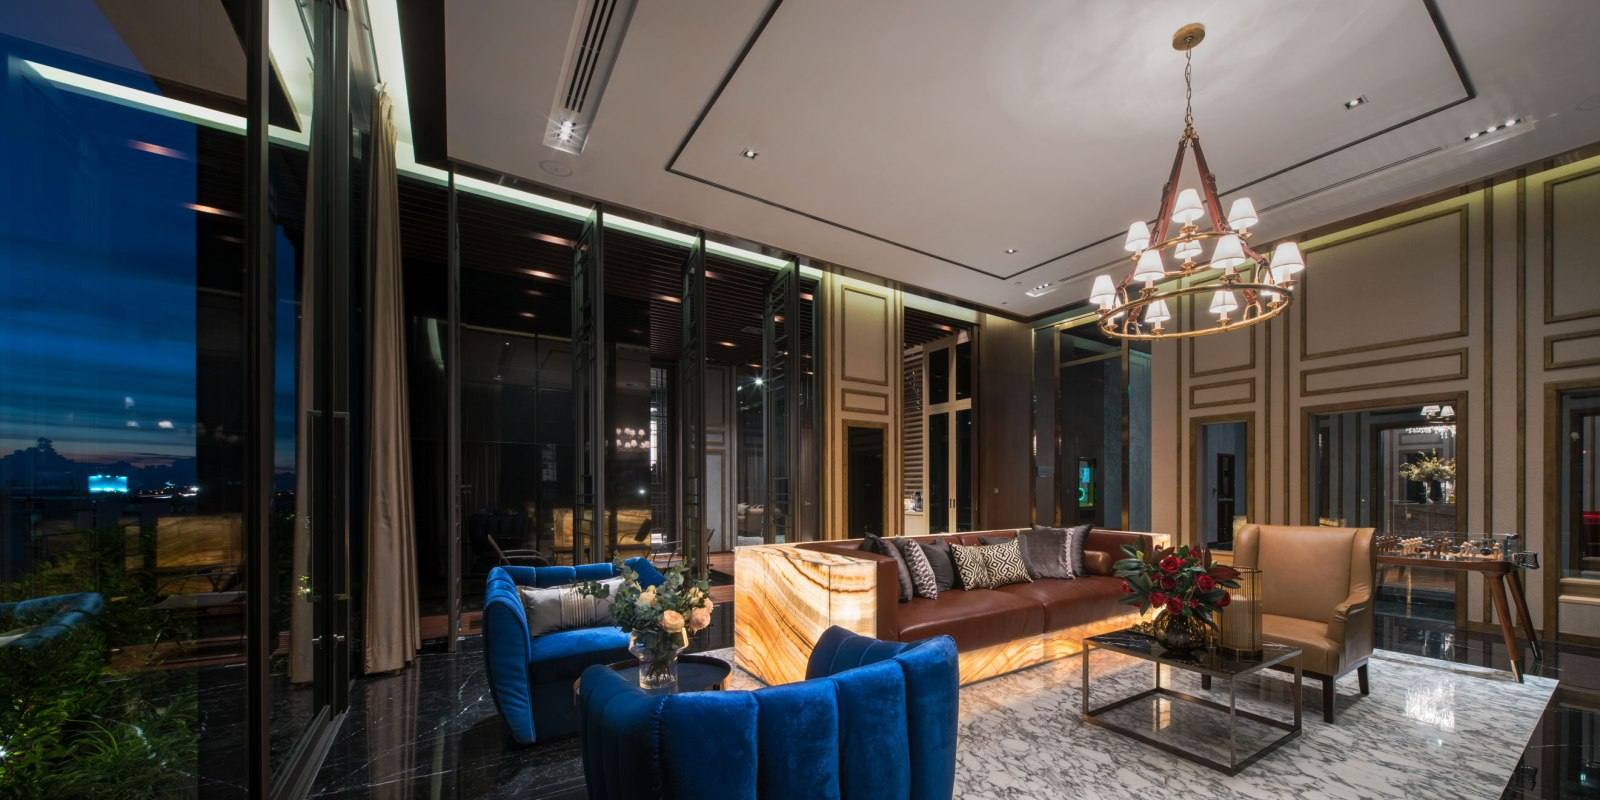 Phuket Real Estate Agency – Thailand – Bangkok – The Monument Sanampao (72)